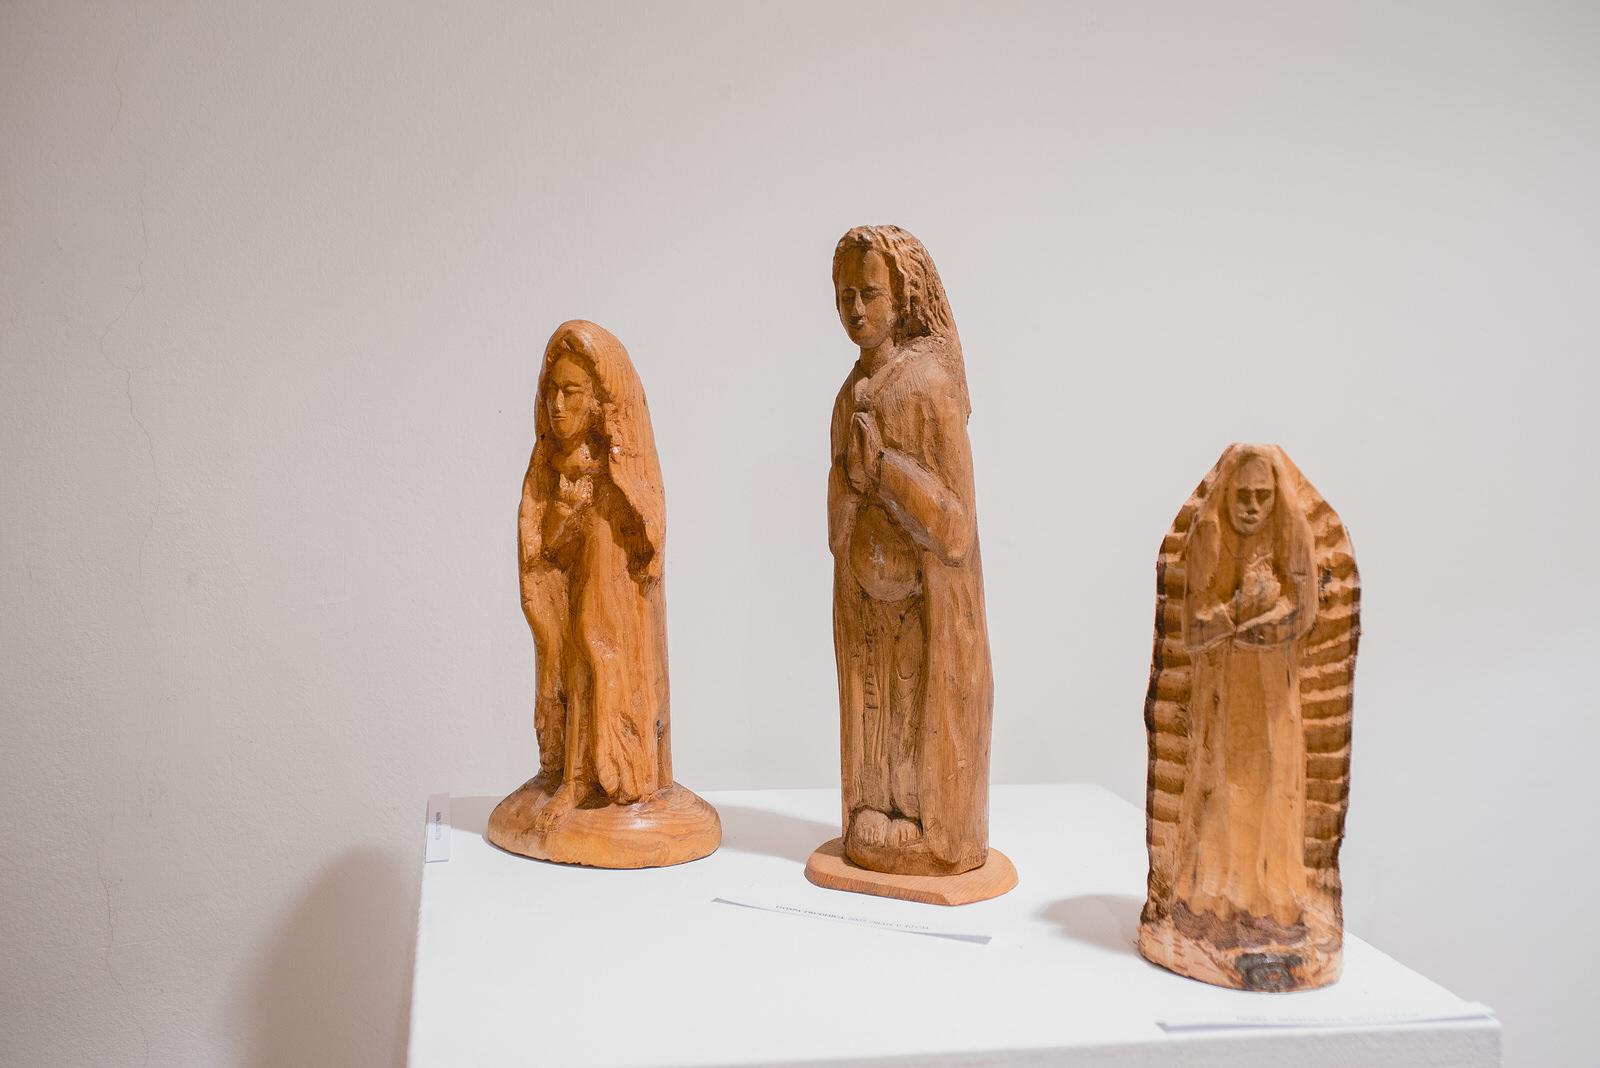 likaclub_gospić_izložba-poetika-skulpture-u-drvu_2019-51